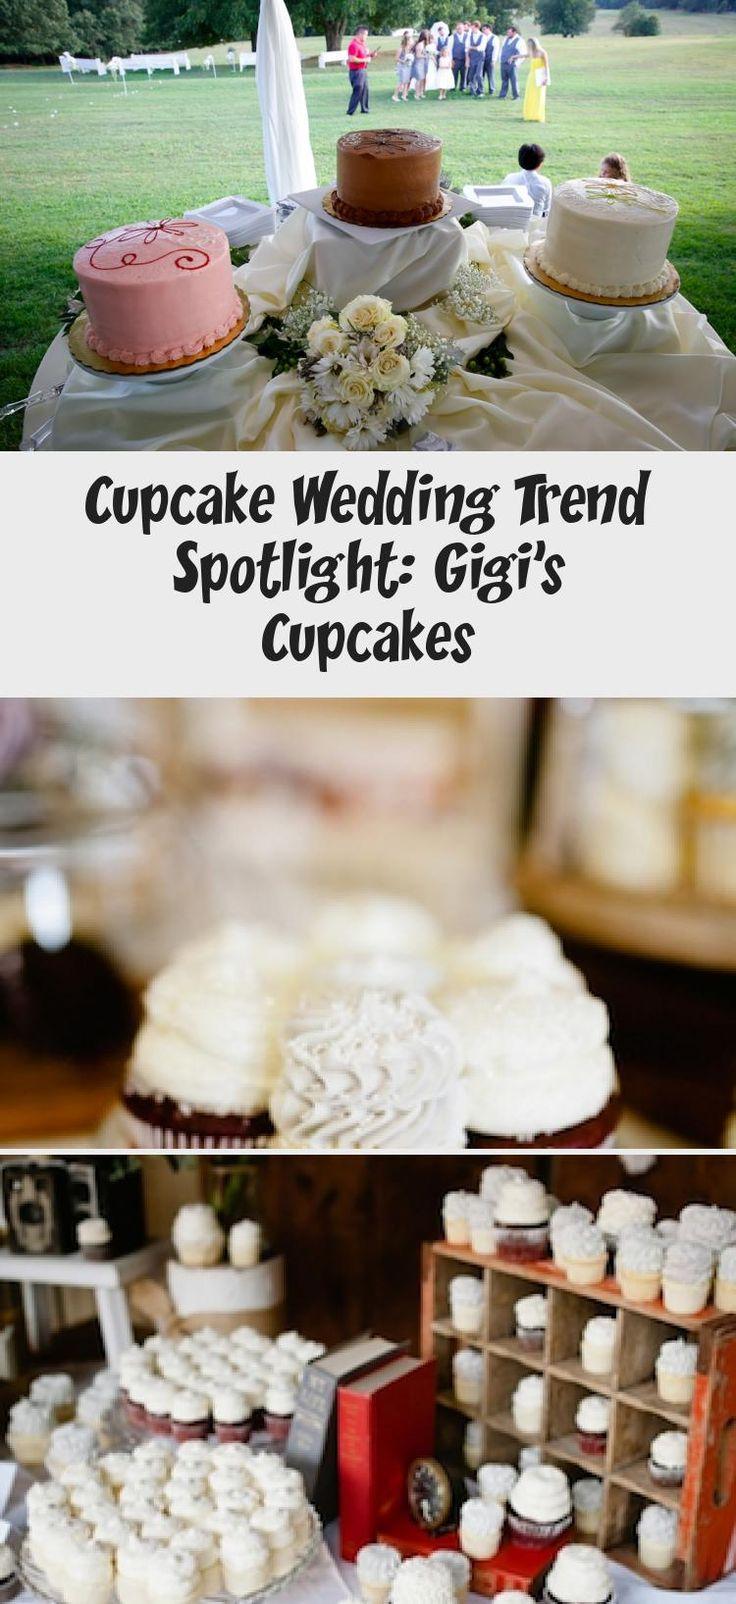 Cupcake Wedding Trend Spotlight Gigi's Cupcakes Cake in